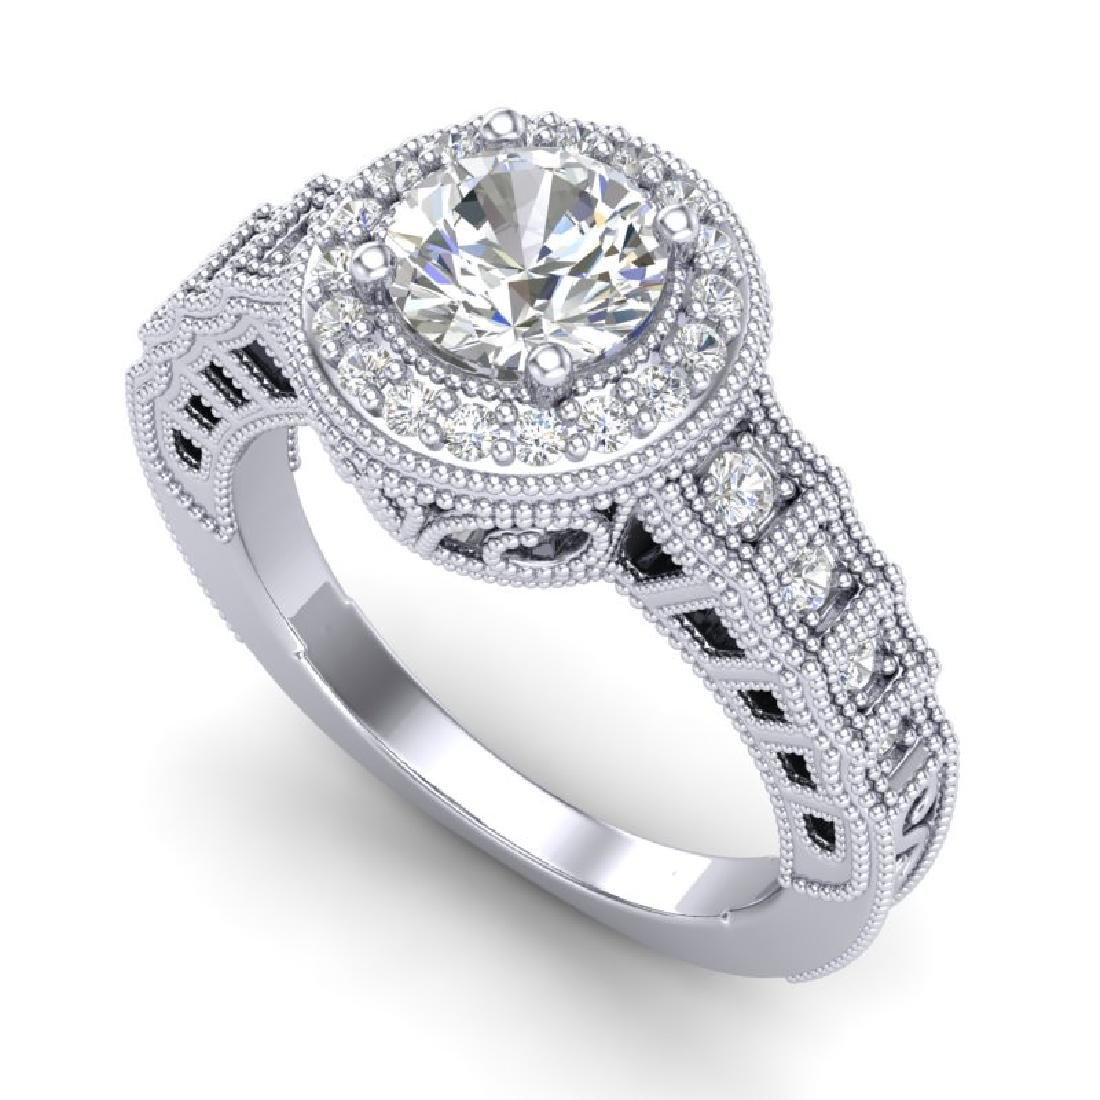 1.53 CTW VS/SI Diamond Art Deco Ring 18K White Gold